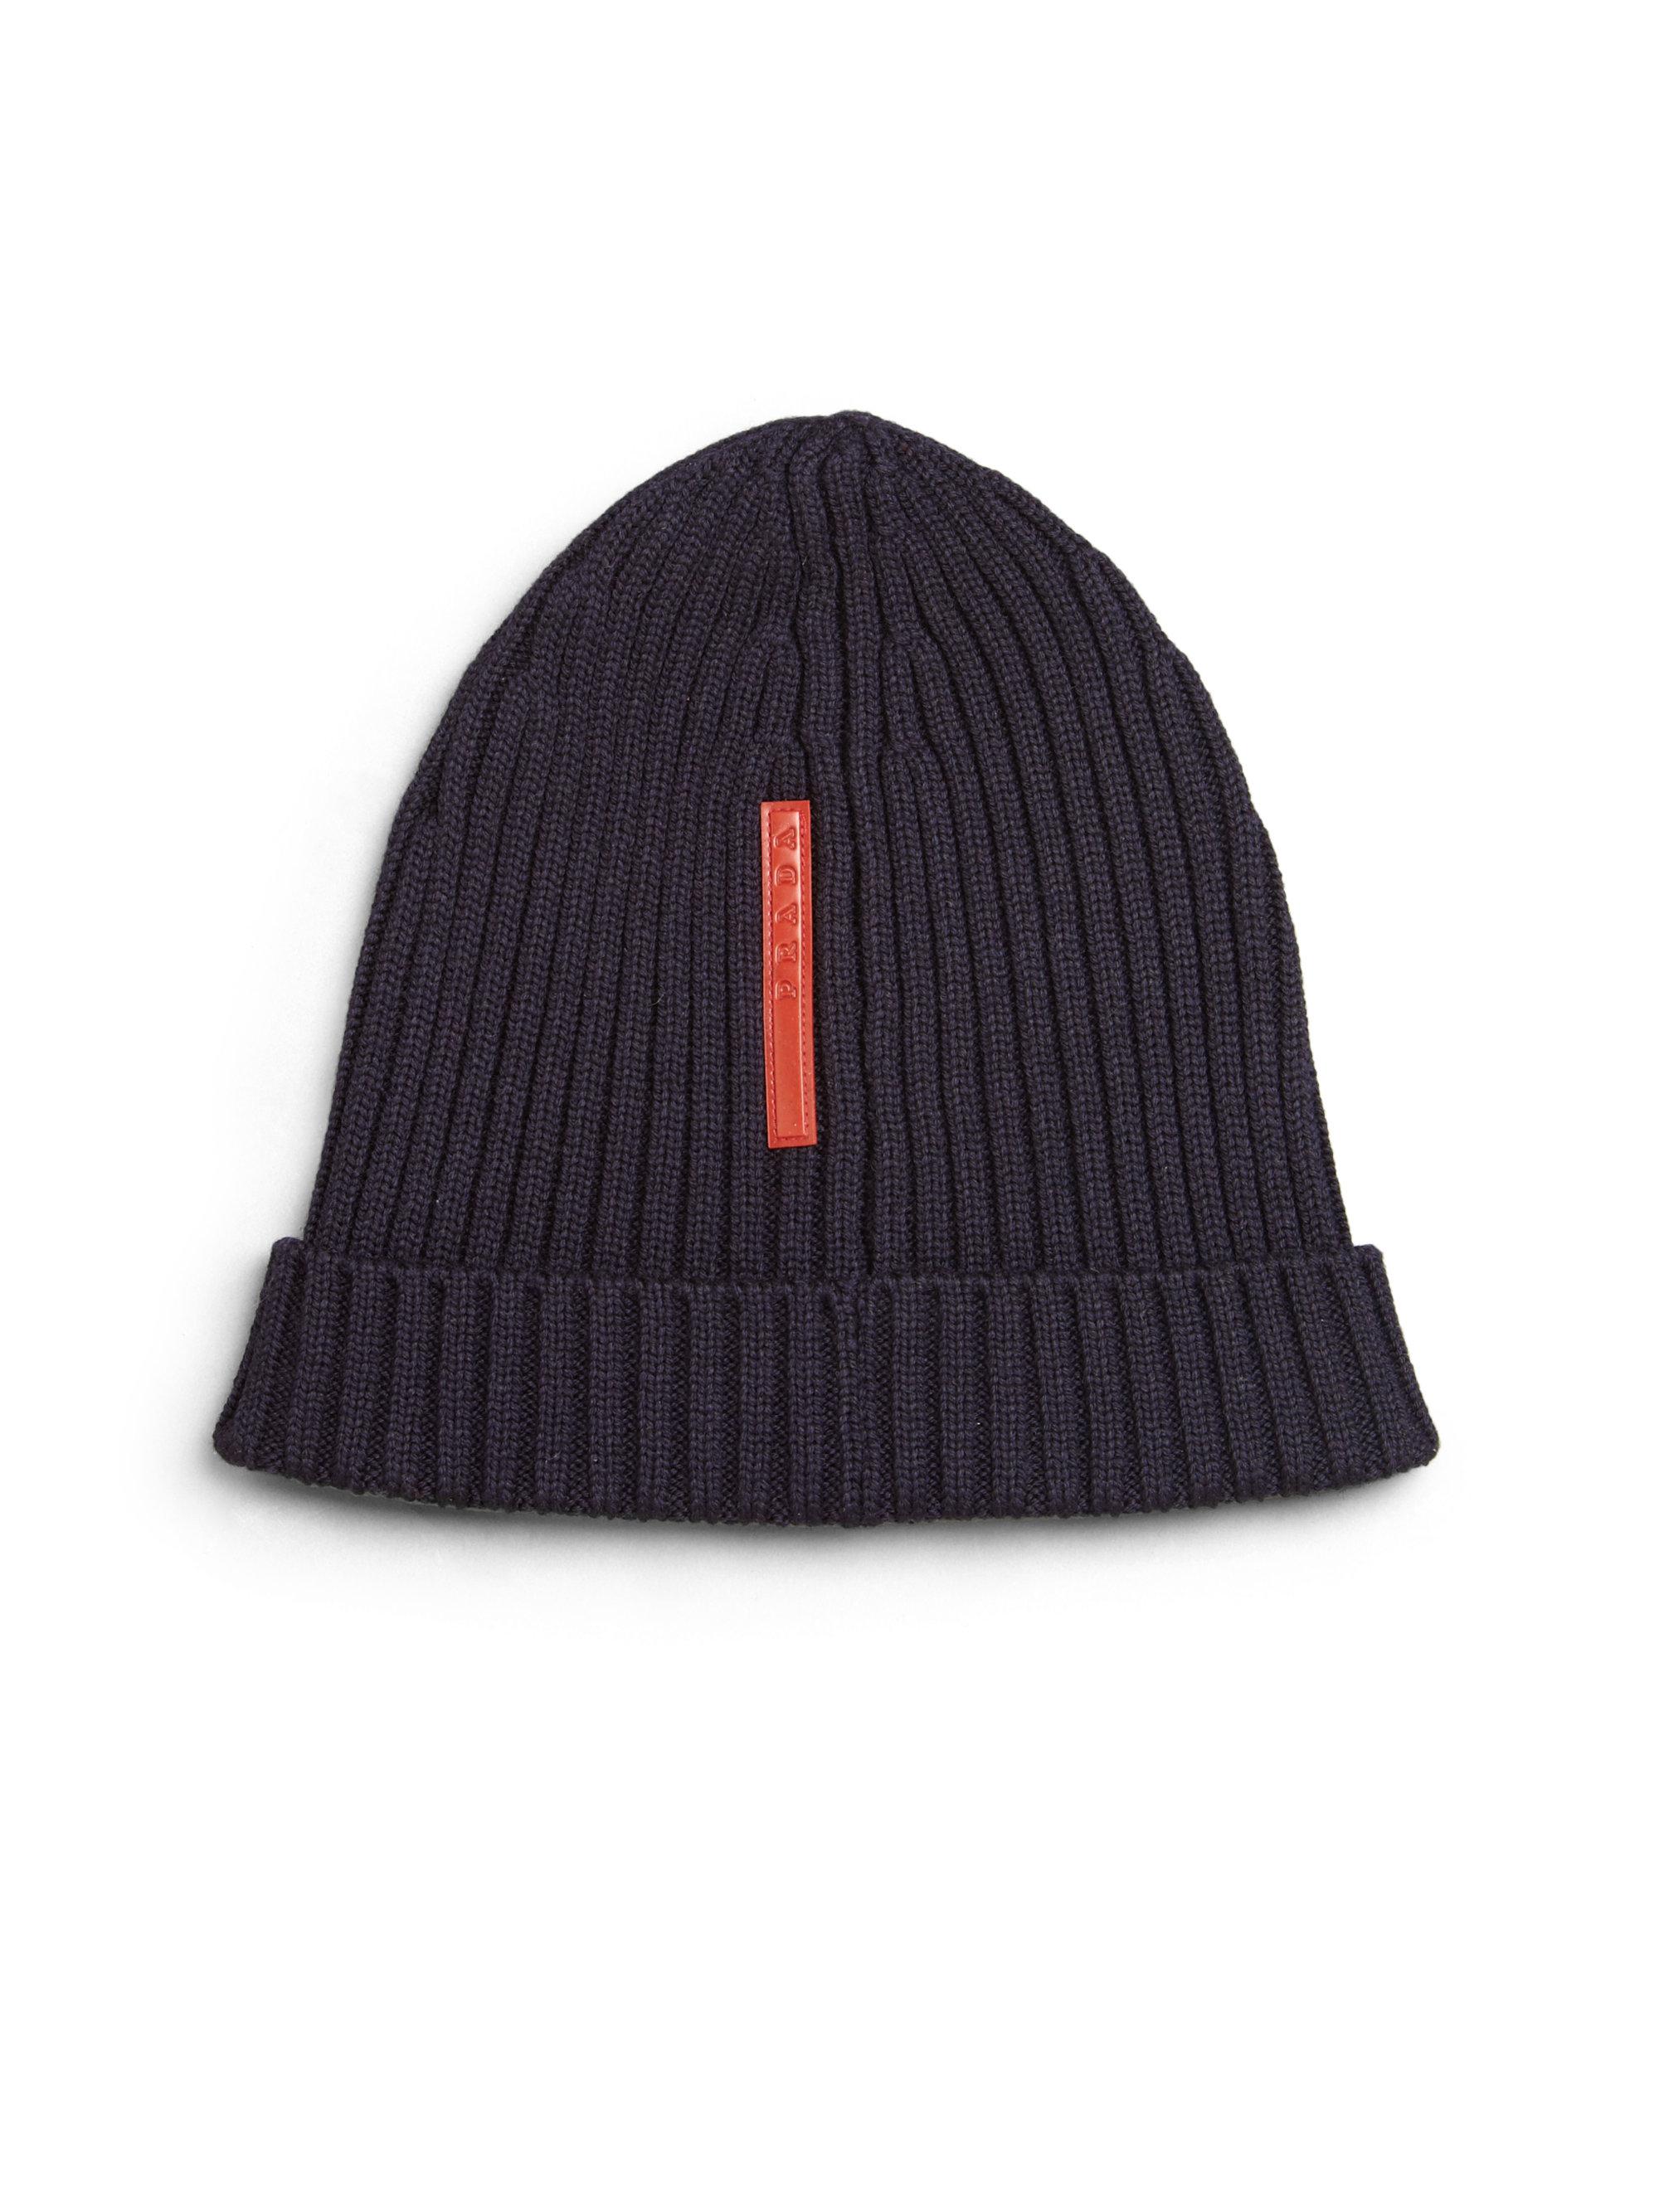 8ffa028a6a7 ebay prada knit hat 07 d168e ffa90  order lyst prada berretto knit beanie  in blue 0059d 0a458